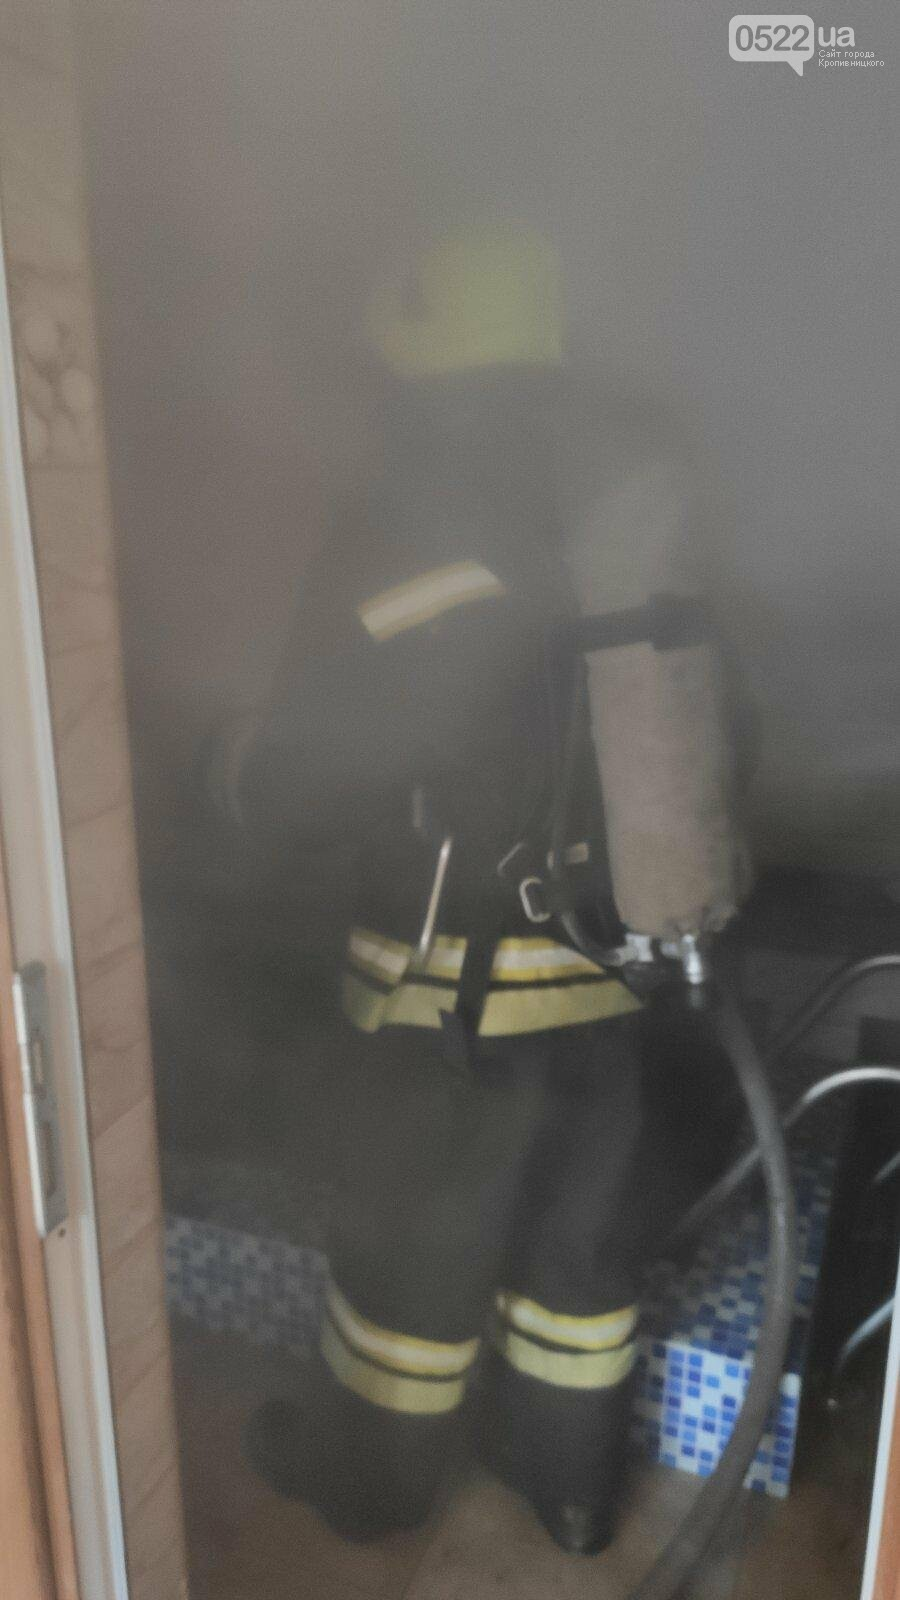 451° по Фаренгейту: лазню так натопили, що ледь загасили, фото-1